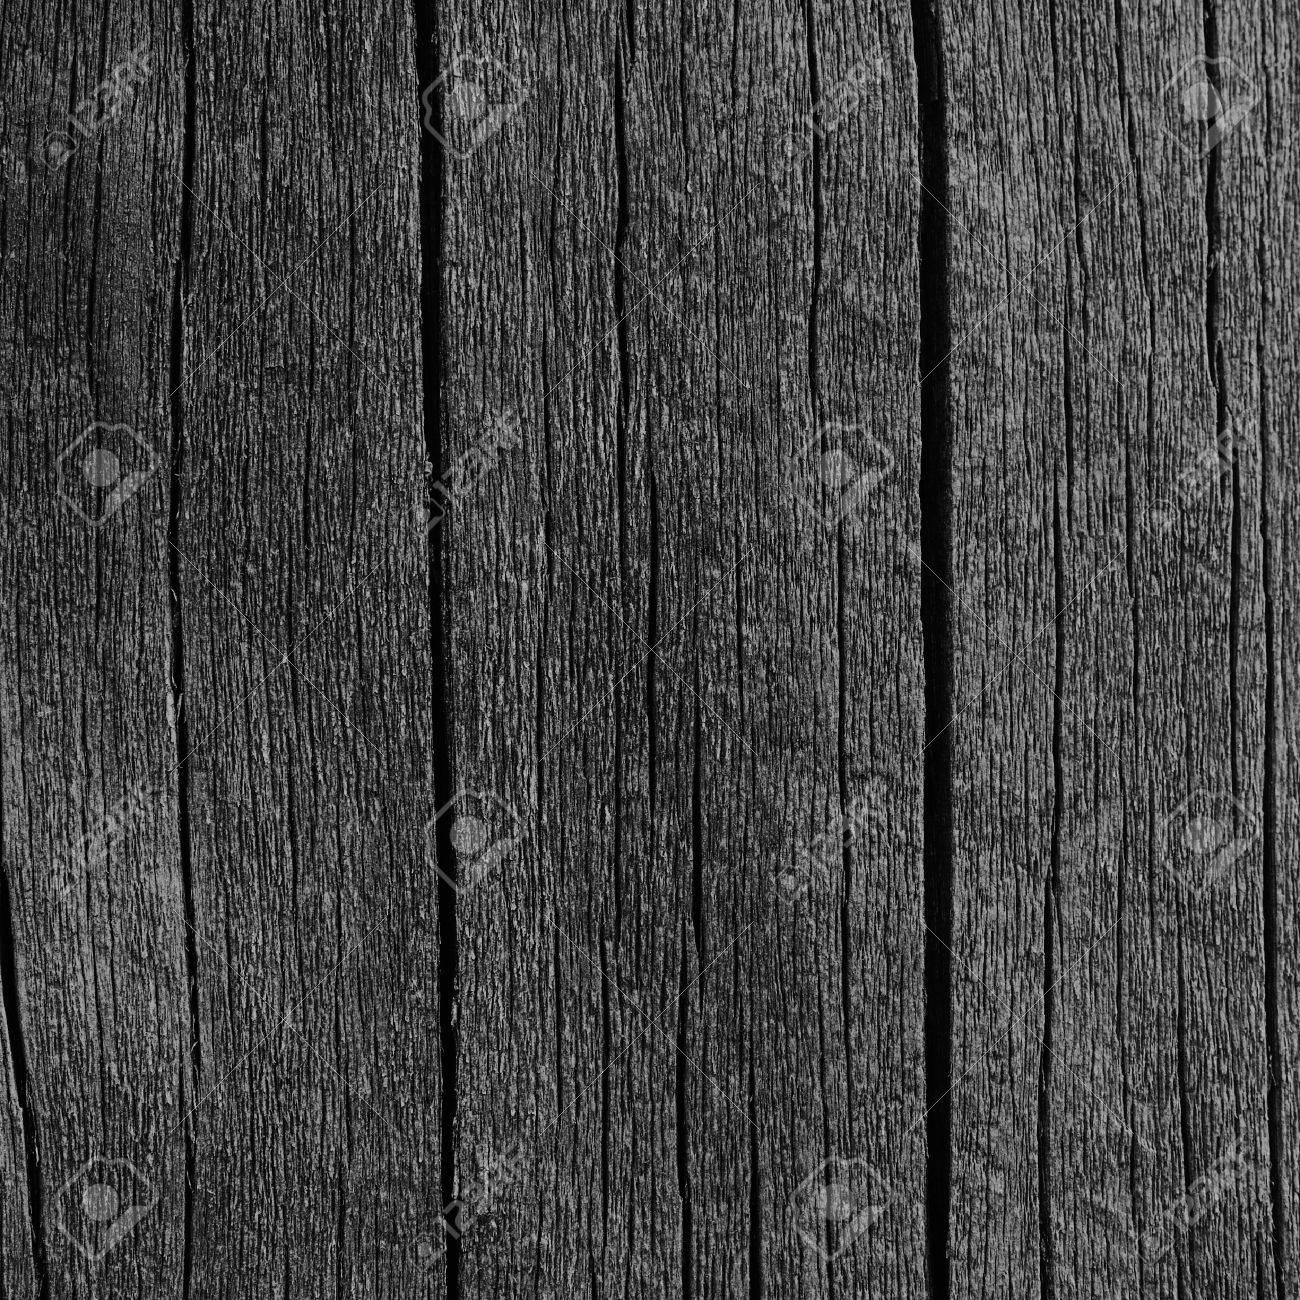 Wooden Plank Board Grey Black Wood Tar Paint Texture Detail Stock